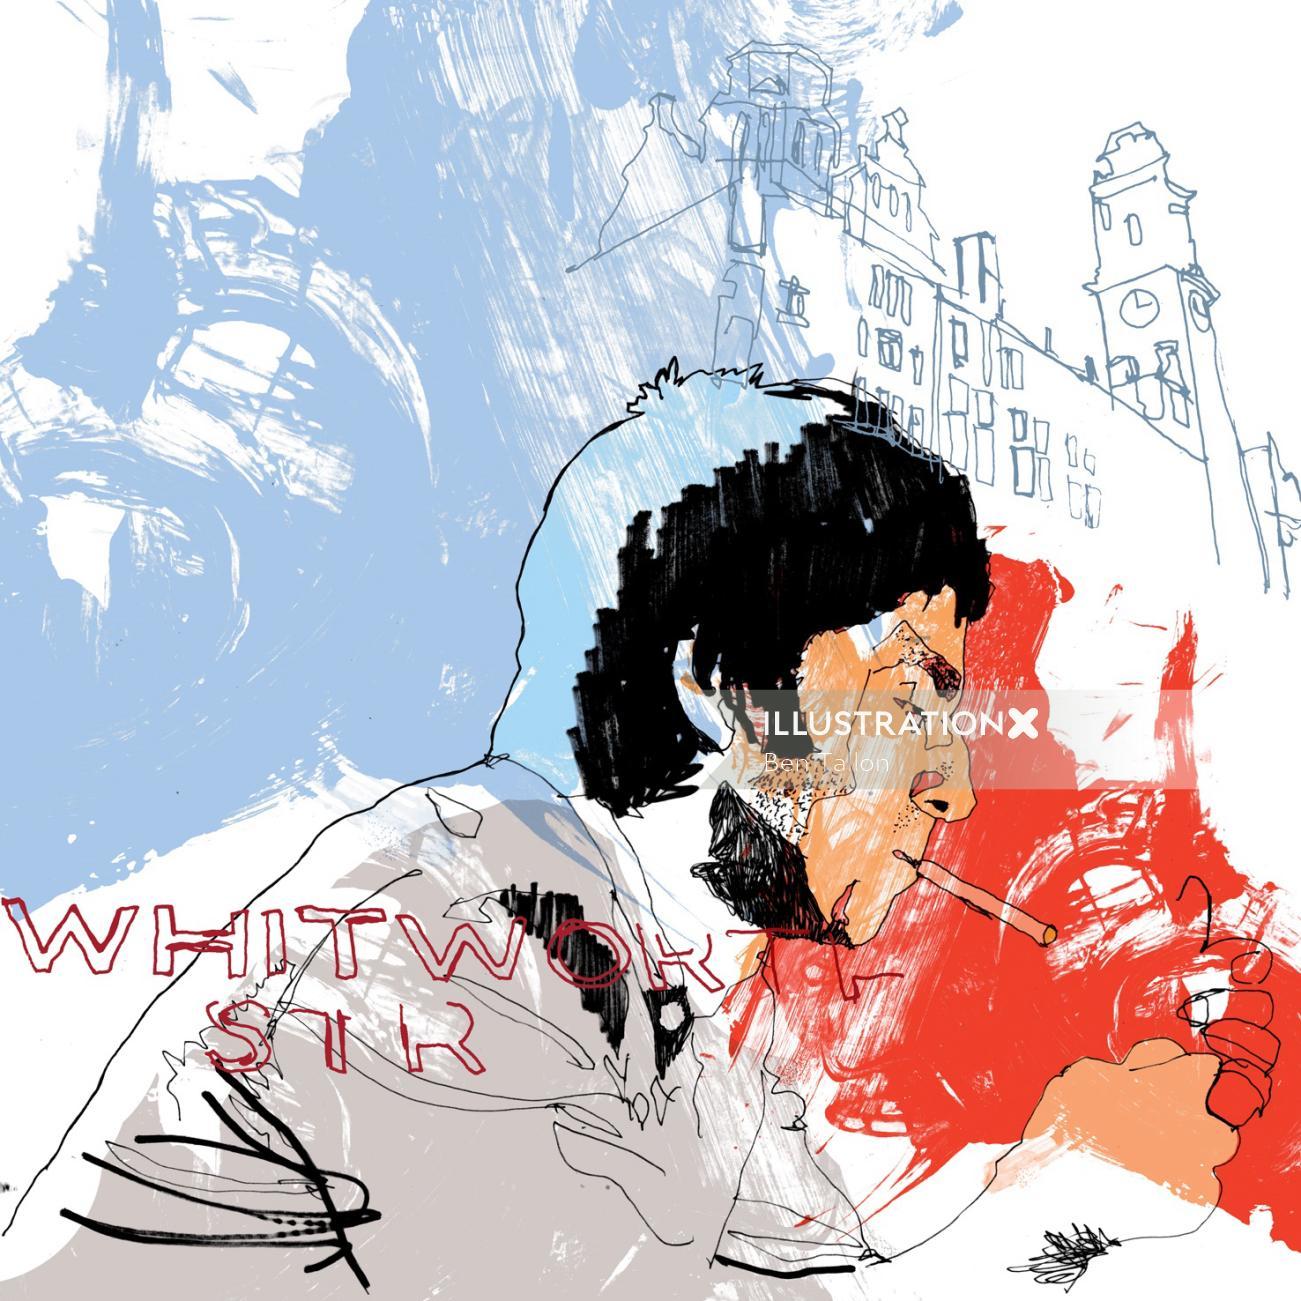 Noel Gallagher illustration by Ben Tallon